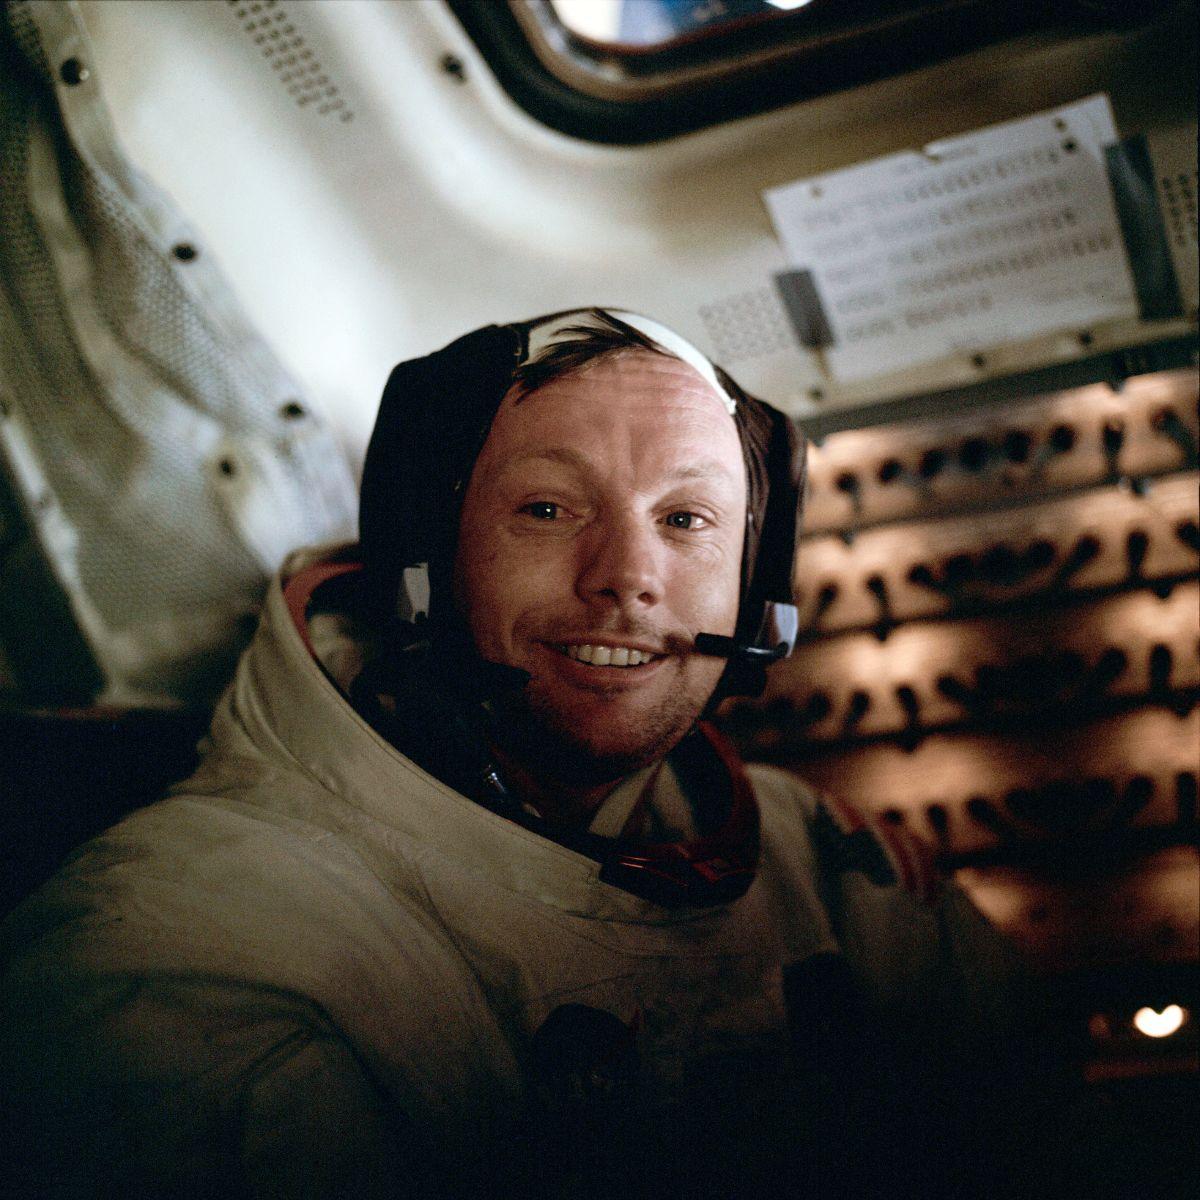 Photograph of Astronaut Neil Armstrong inside the lunar module